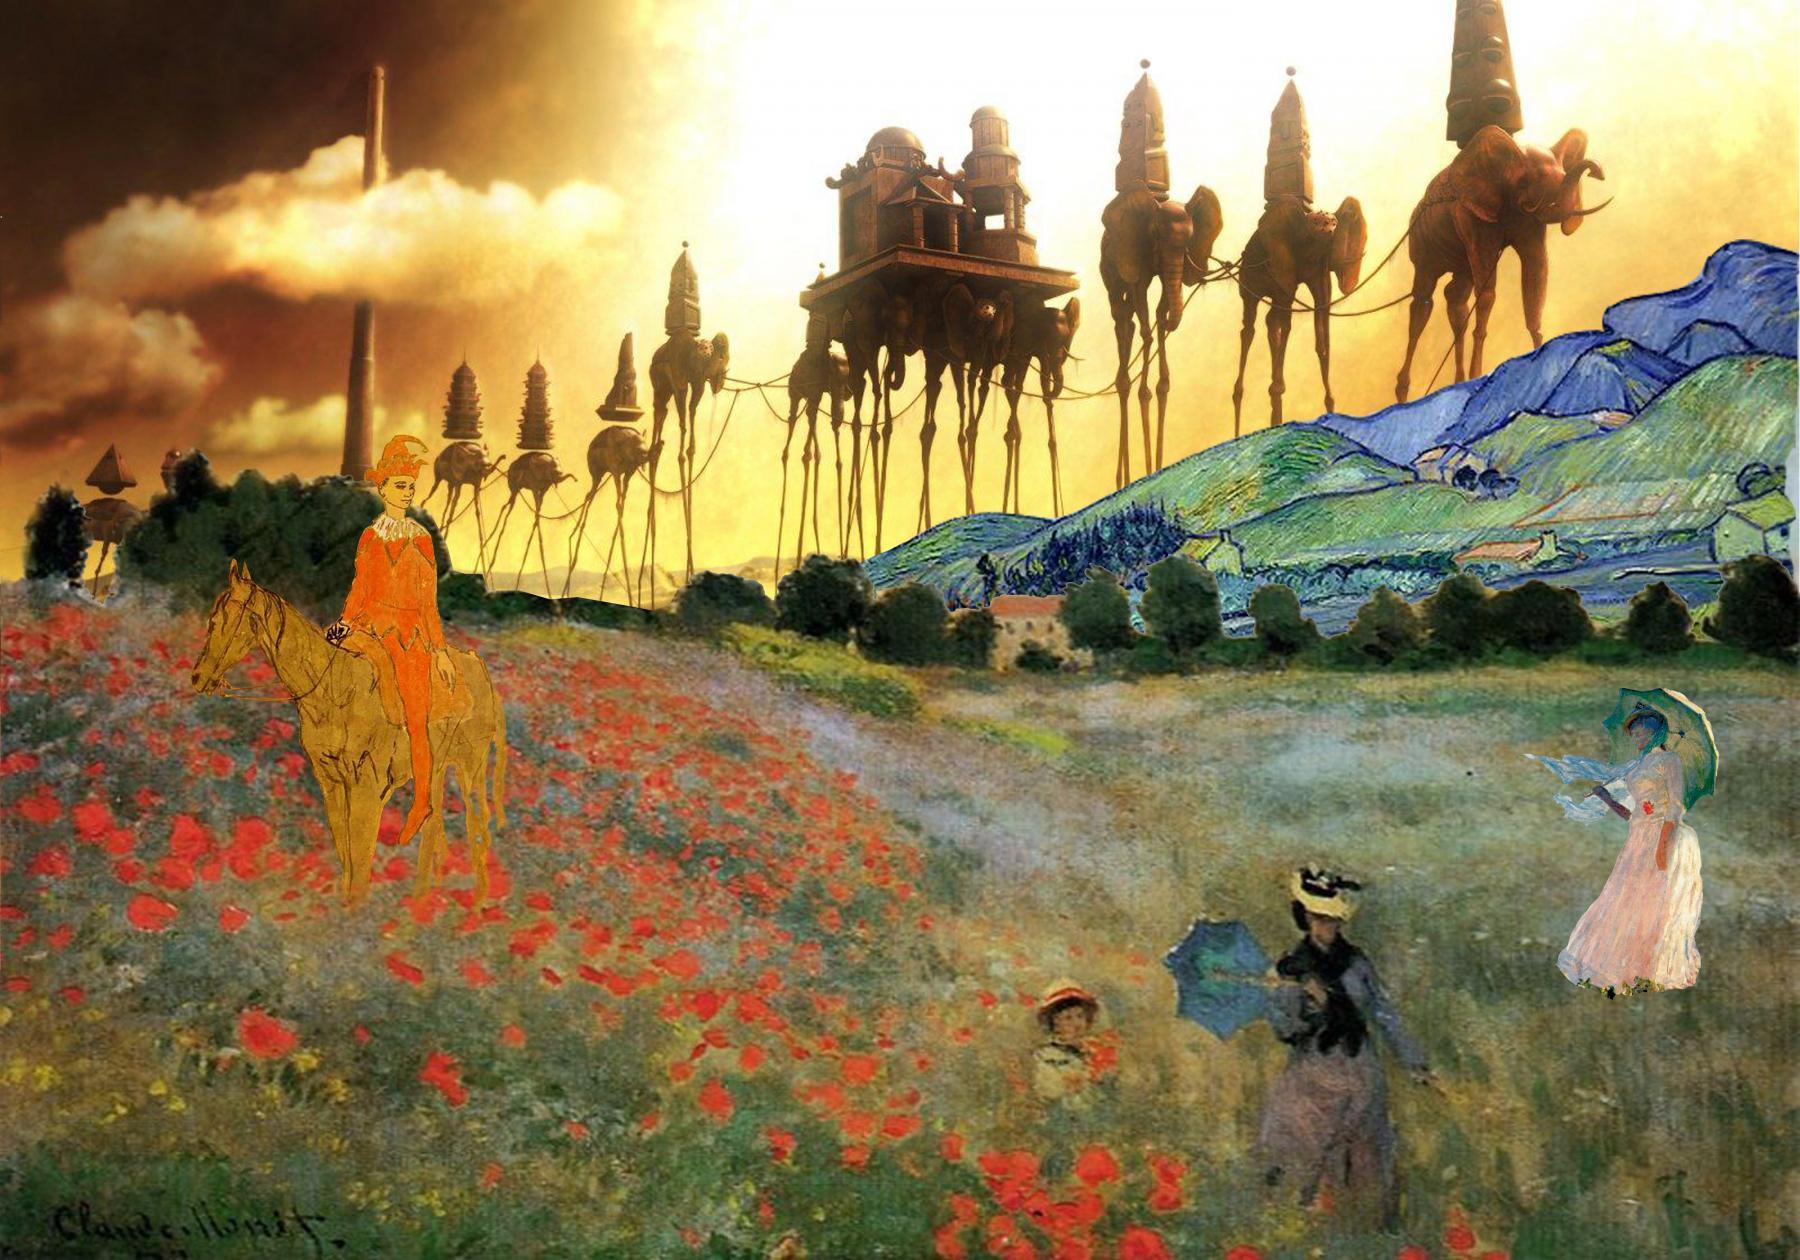 Caravana de elefantes asomando sobre un paisaje montañoso mientras un arlequín a caballo mira a las mujeres con sombrillas sobre un campo de amapolas